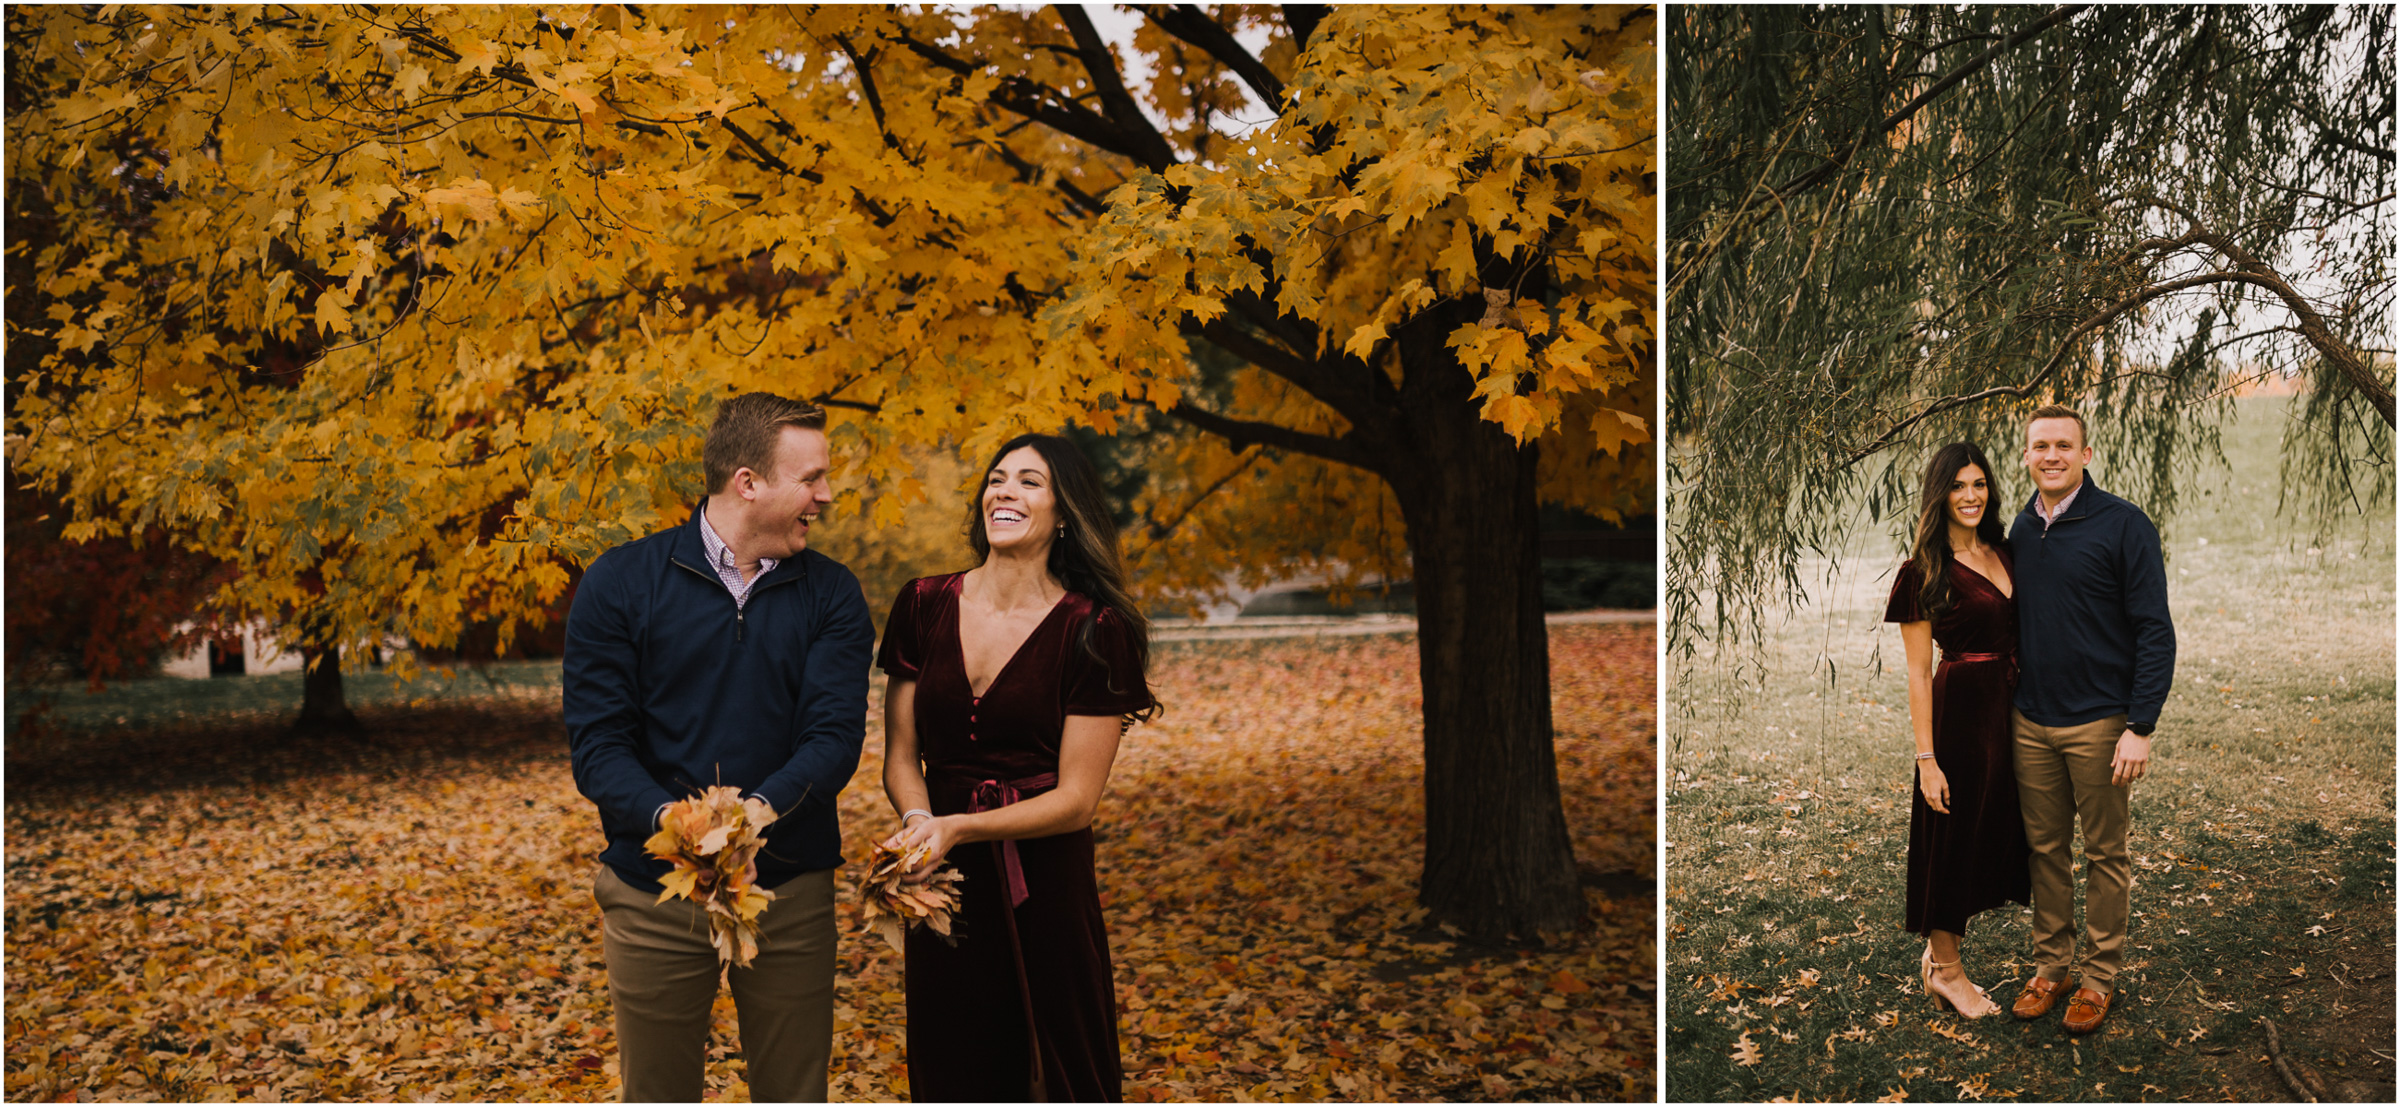 alyssa barletter photography loose park fall engagement photos autumn wedding photography-10.jpg